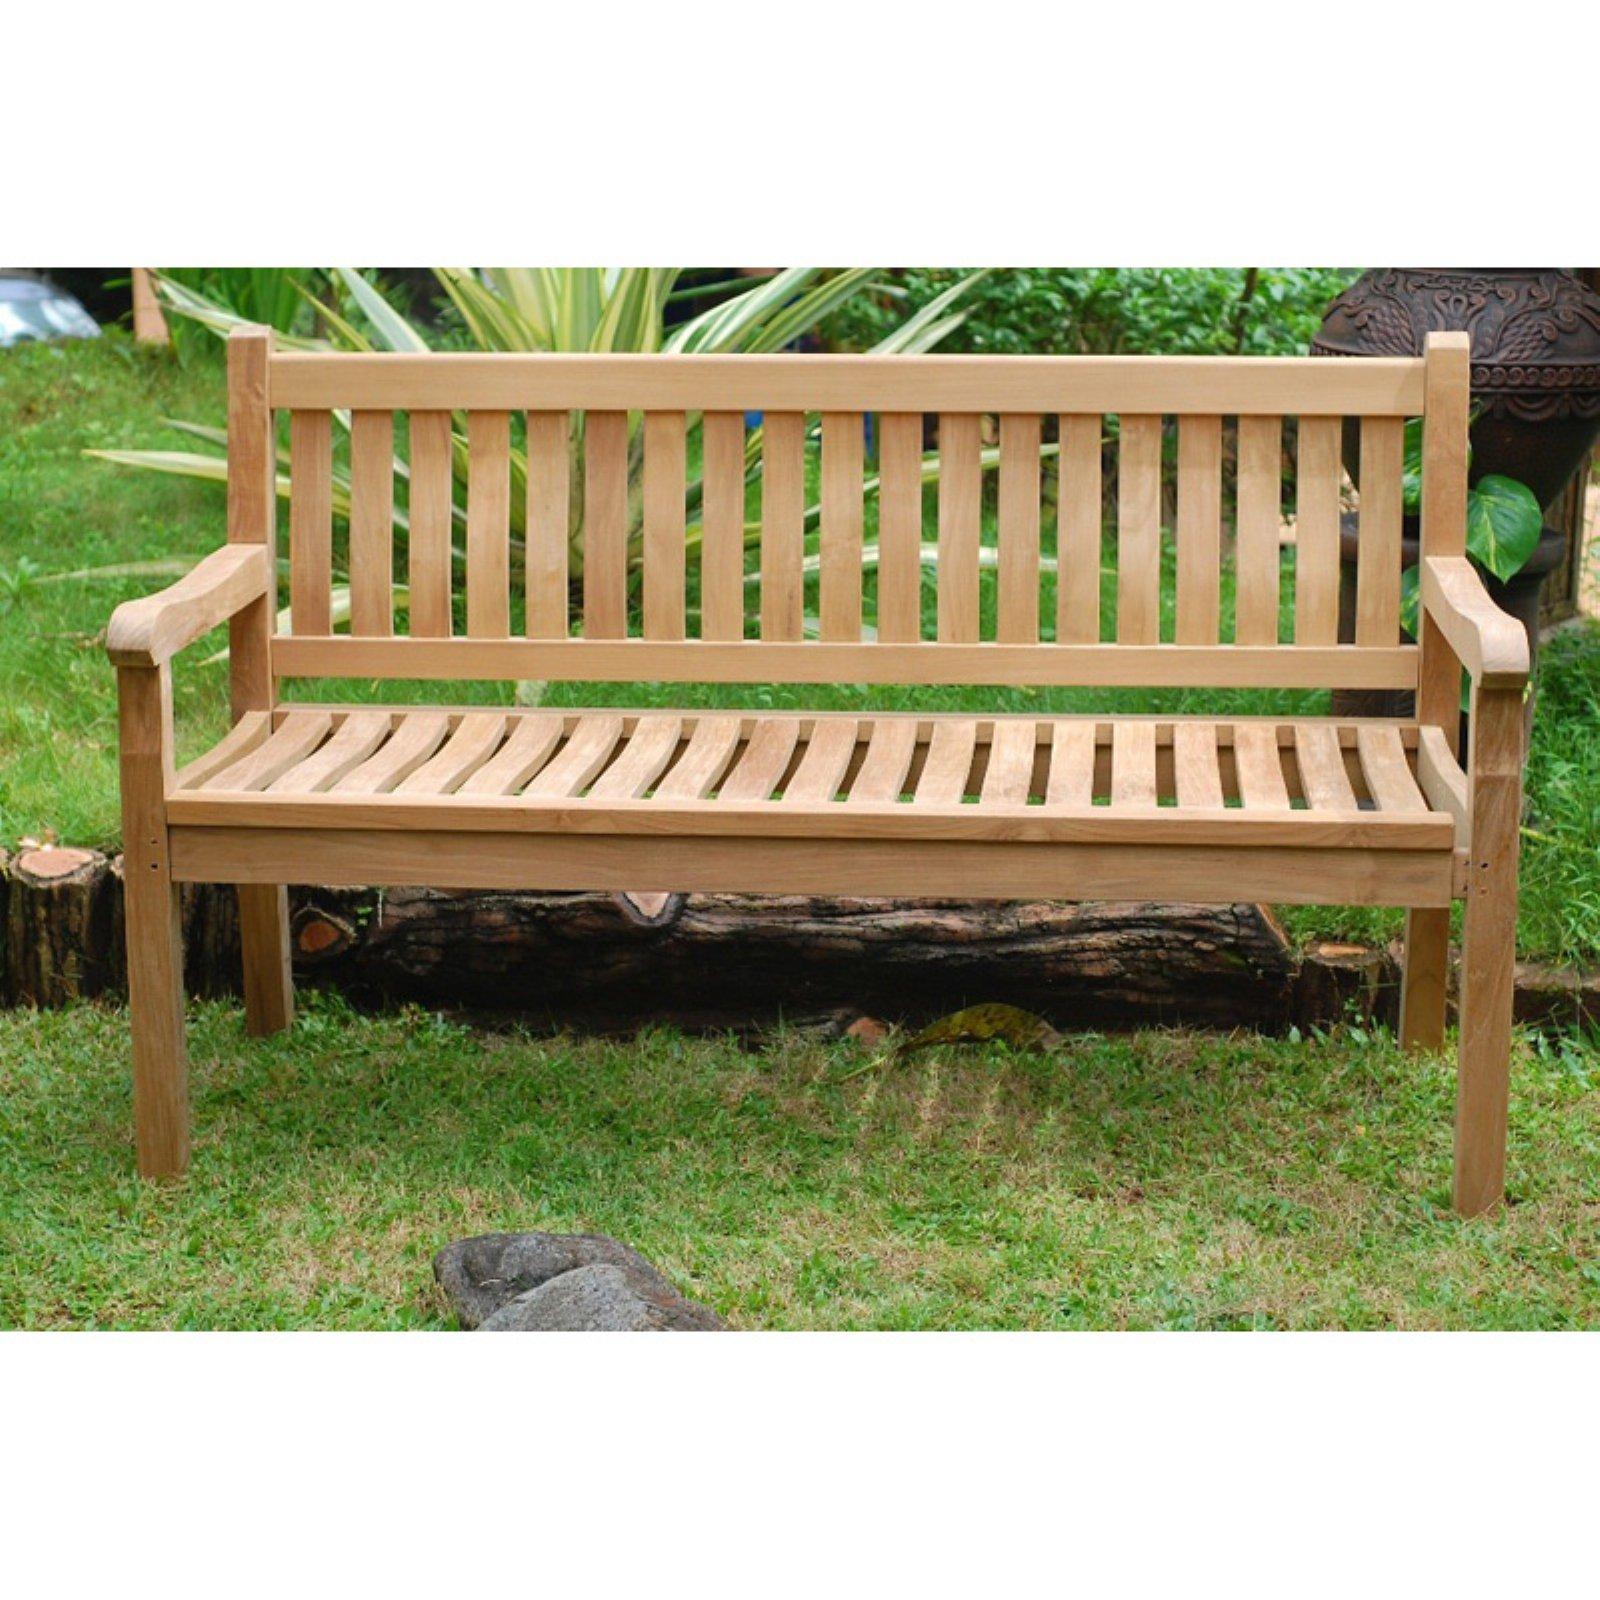 Windsor Teak Furniture Outdoor Bench with Contoured Seat by Windsor Teak Furniture